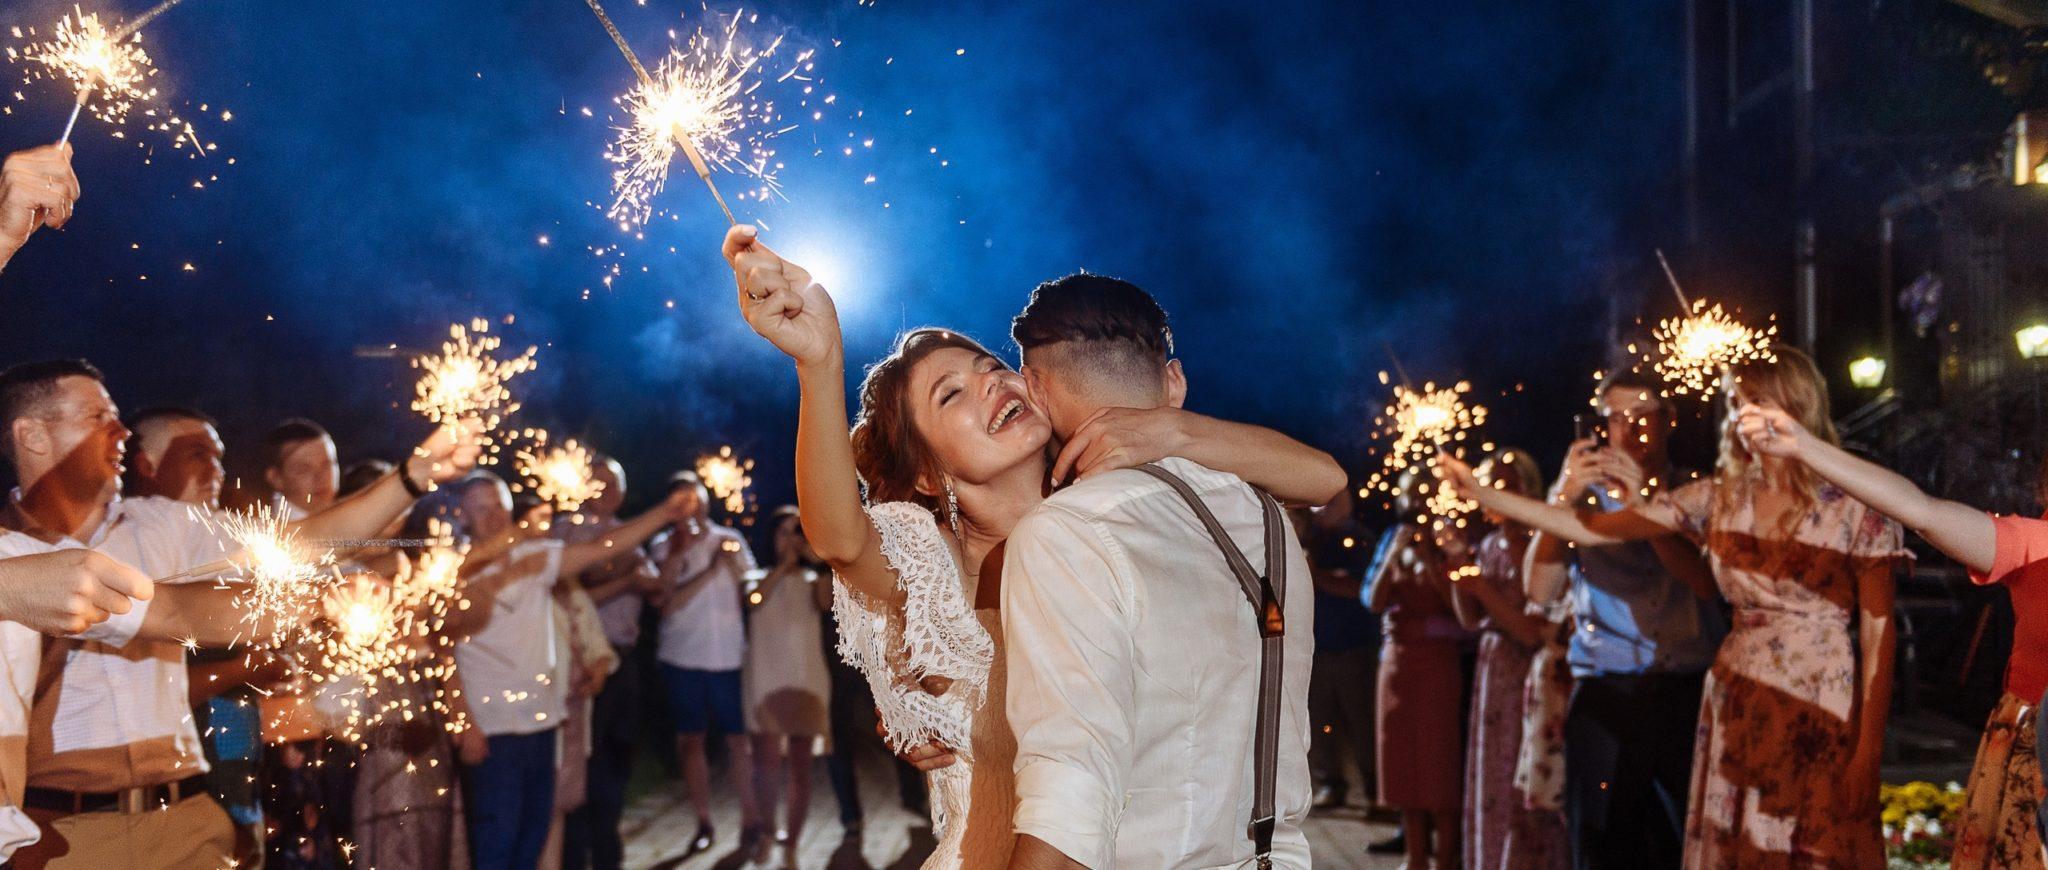 Свадьба Вологда